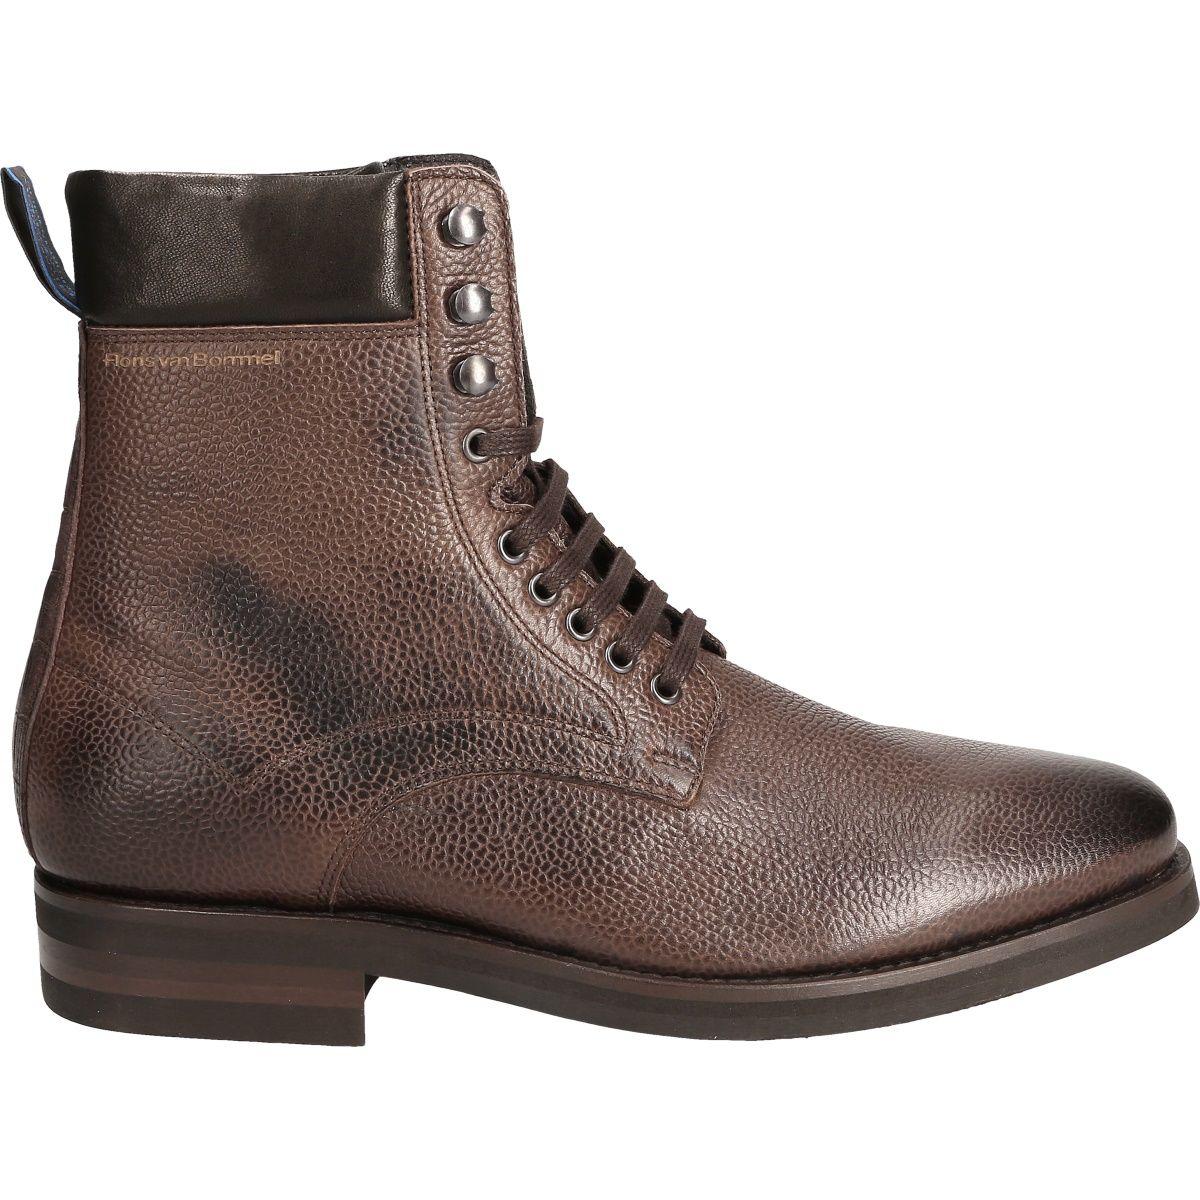 langlebig im einsatz Beförderung Rabatt Floris van Bommel 10658/00 Men's shoes Ankle Boots buy shoes ...